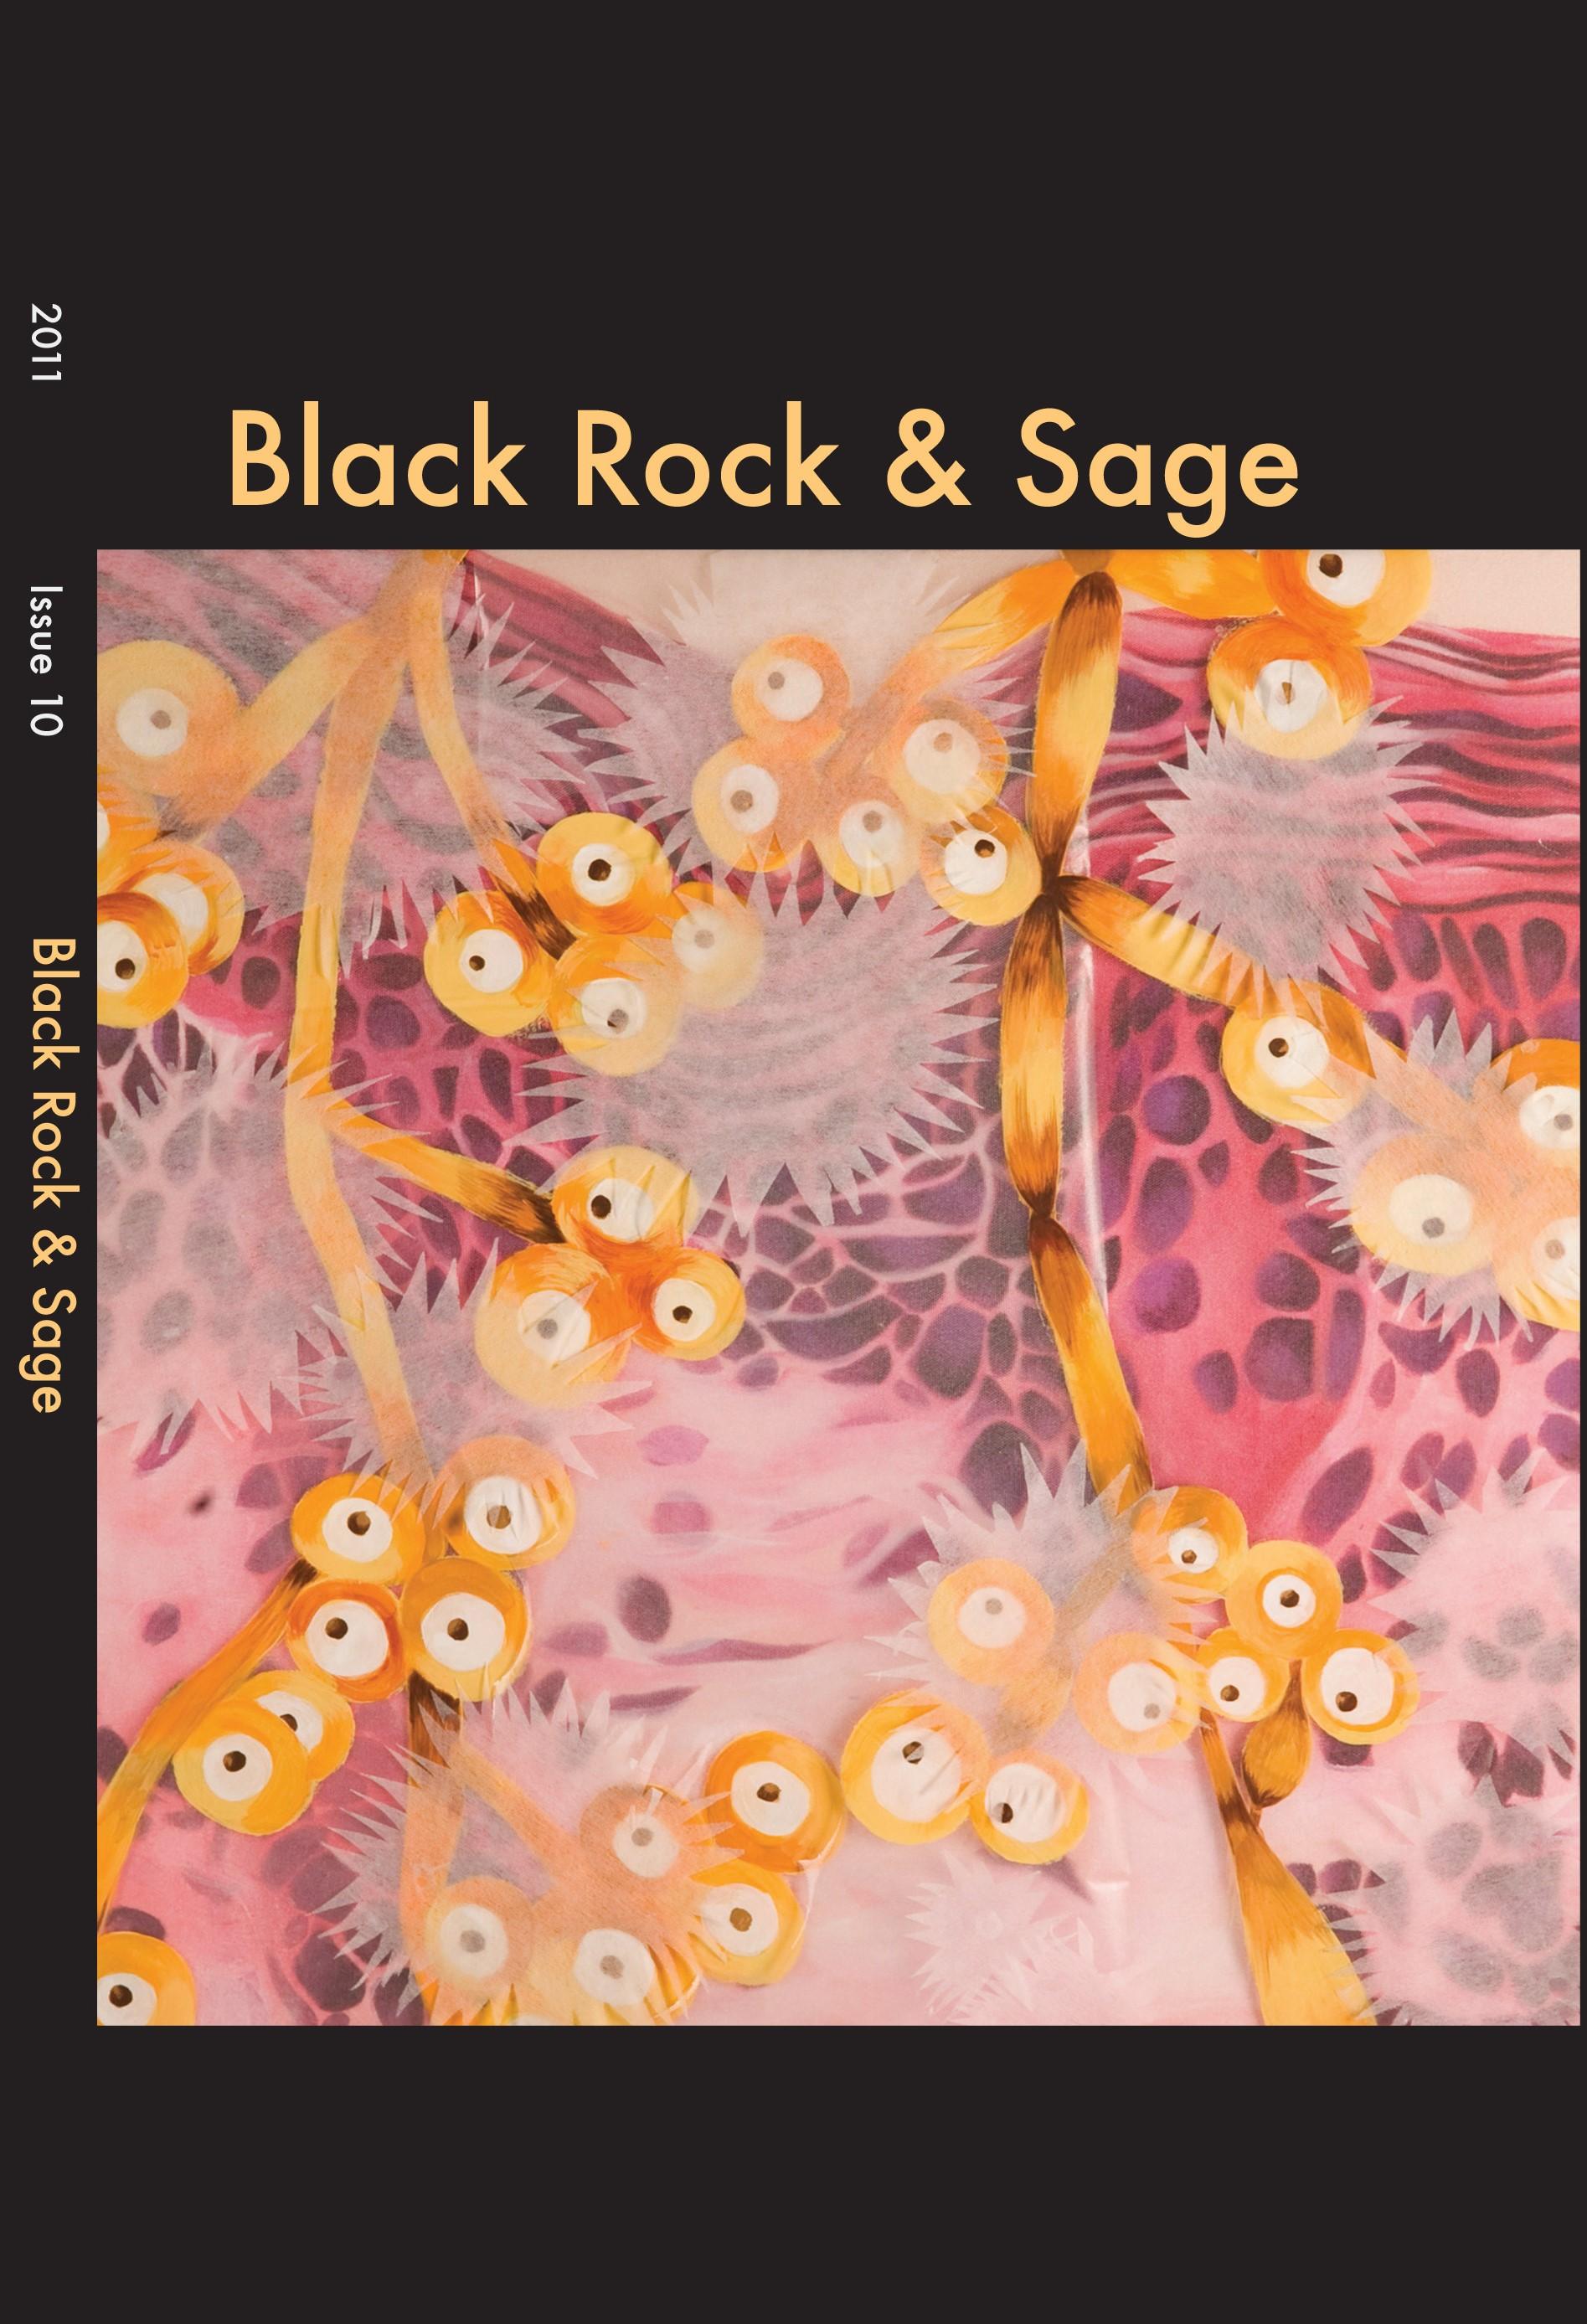 brs cover 2011-2 copy